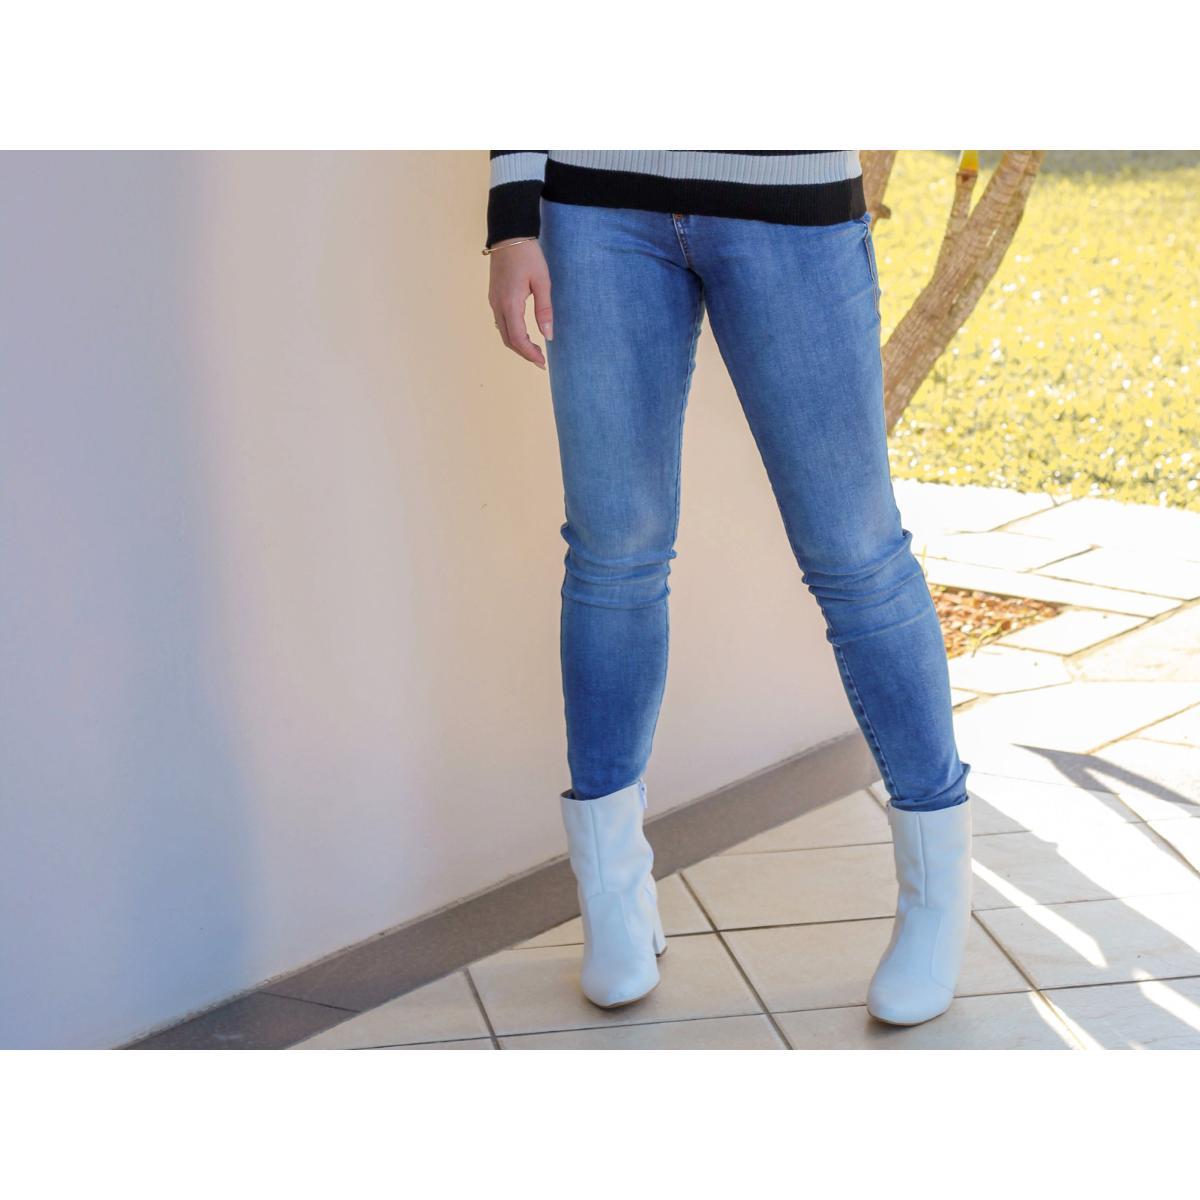 Calça Feminina Index 01.01.005016 Jeans